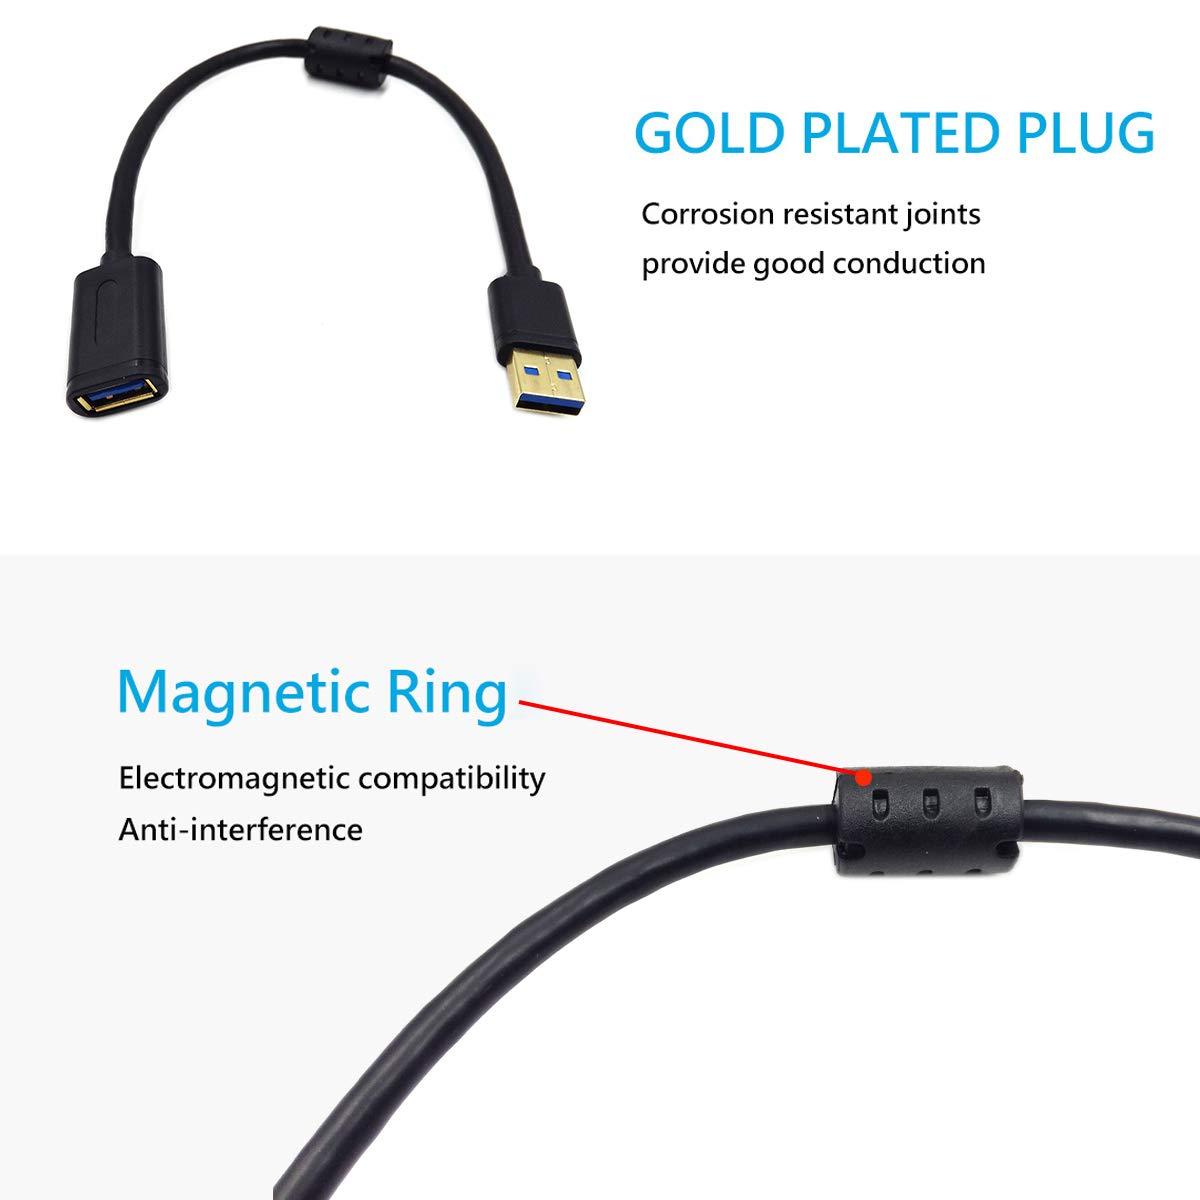 USB AM//BM Xerox Poyiccot Magnetic USB Type B Cable 30cm Dell Epson Lexmark Samsung USB Printer Cable USB 3.0 Type A Male to B Male with Magnetic Ring Scanner Cord for HP Canon